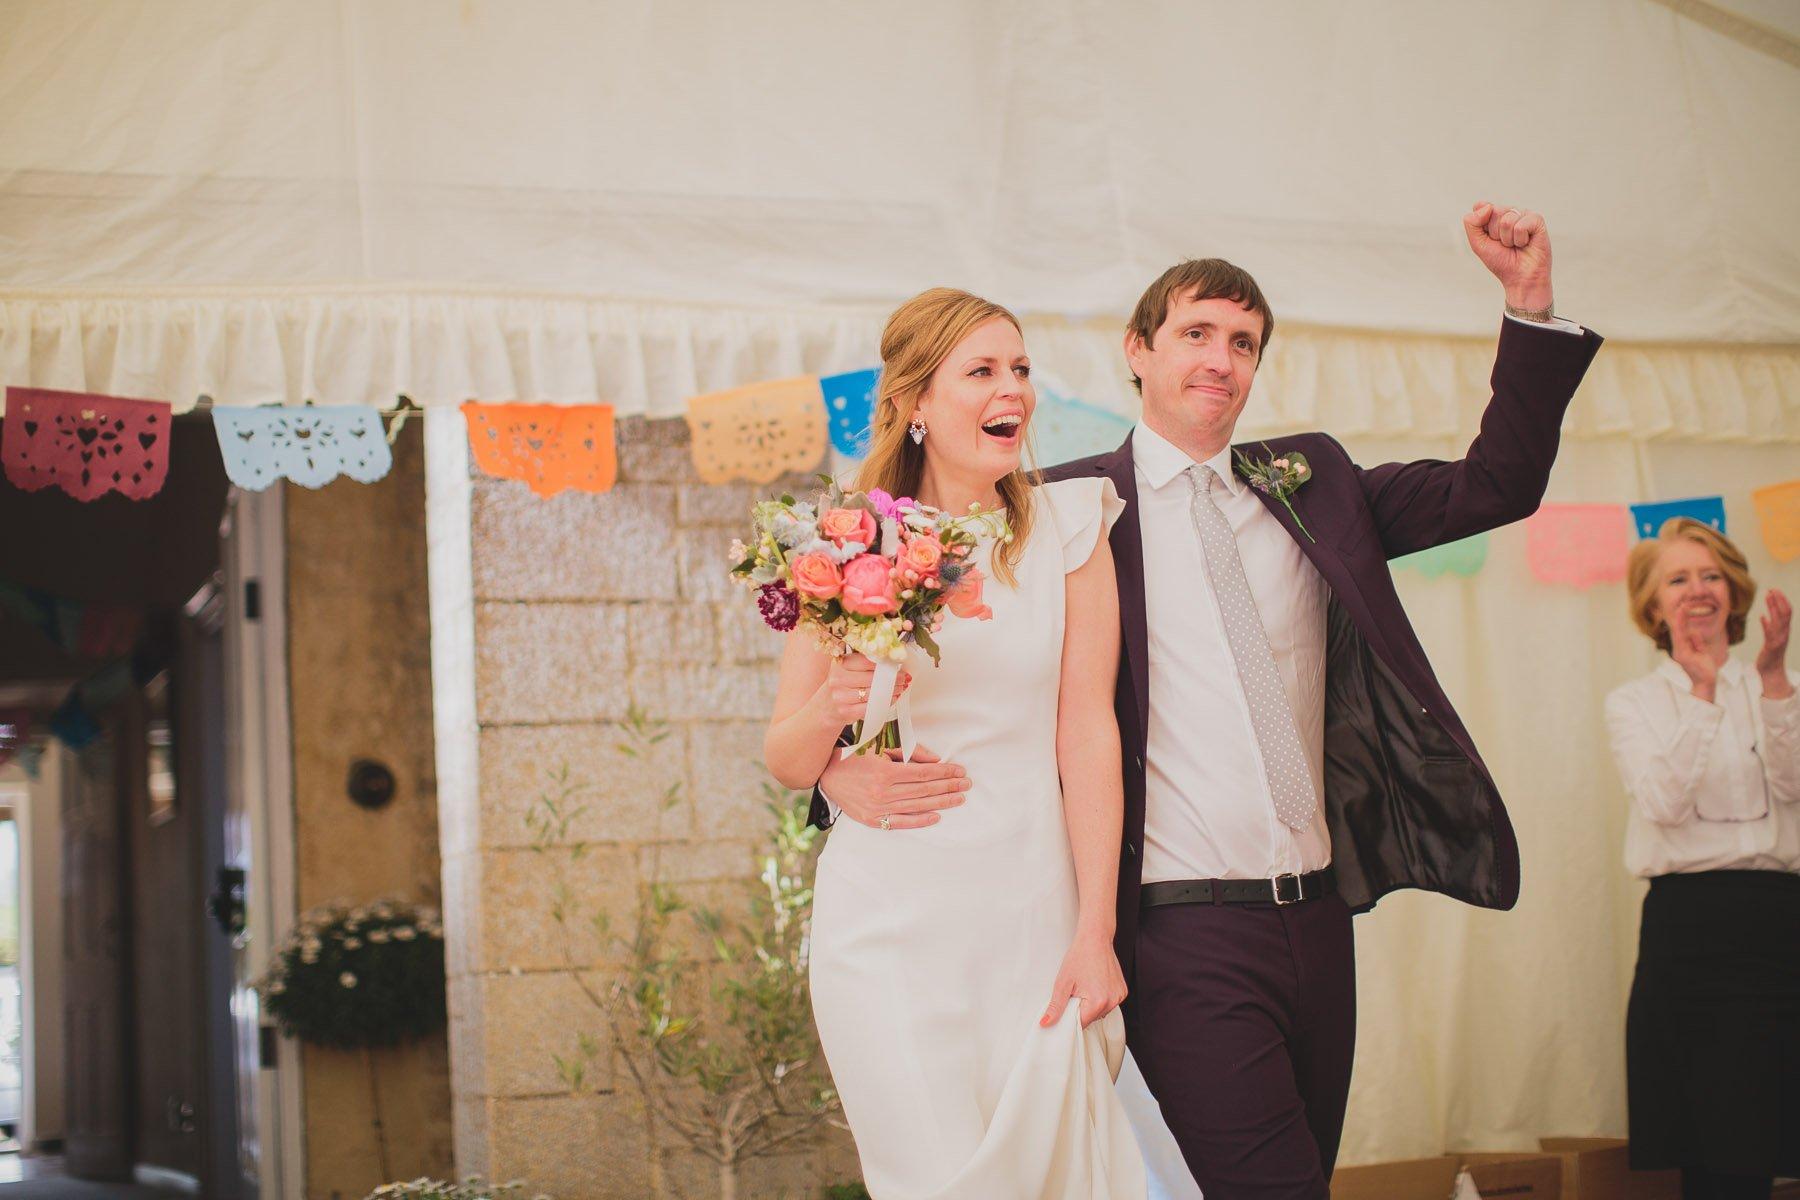 Buckinghamshire-Wedding-Lizzie-Duncan-118